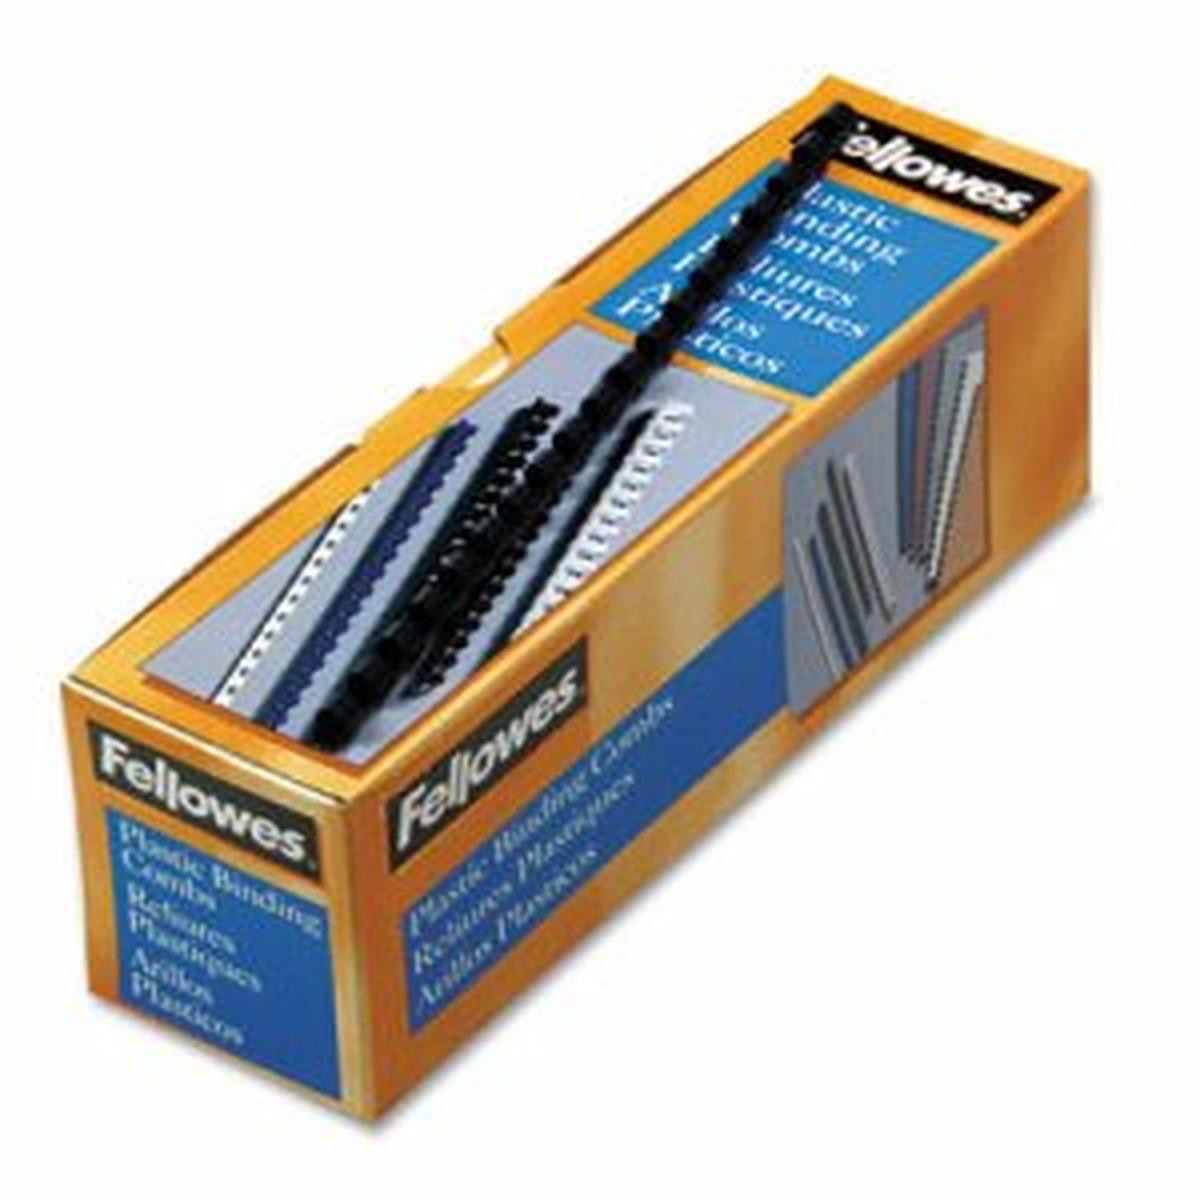 "Plastic Comb Bindings, 5/16"" Dia, 40 Sheet Capacity, Navy Blue, 100 Combs/Pack"